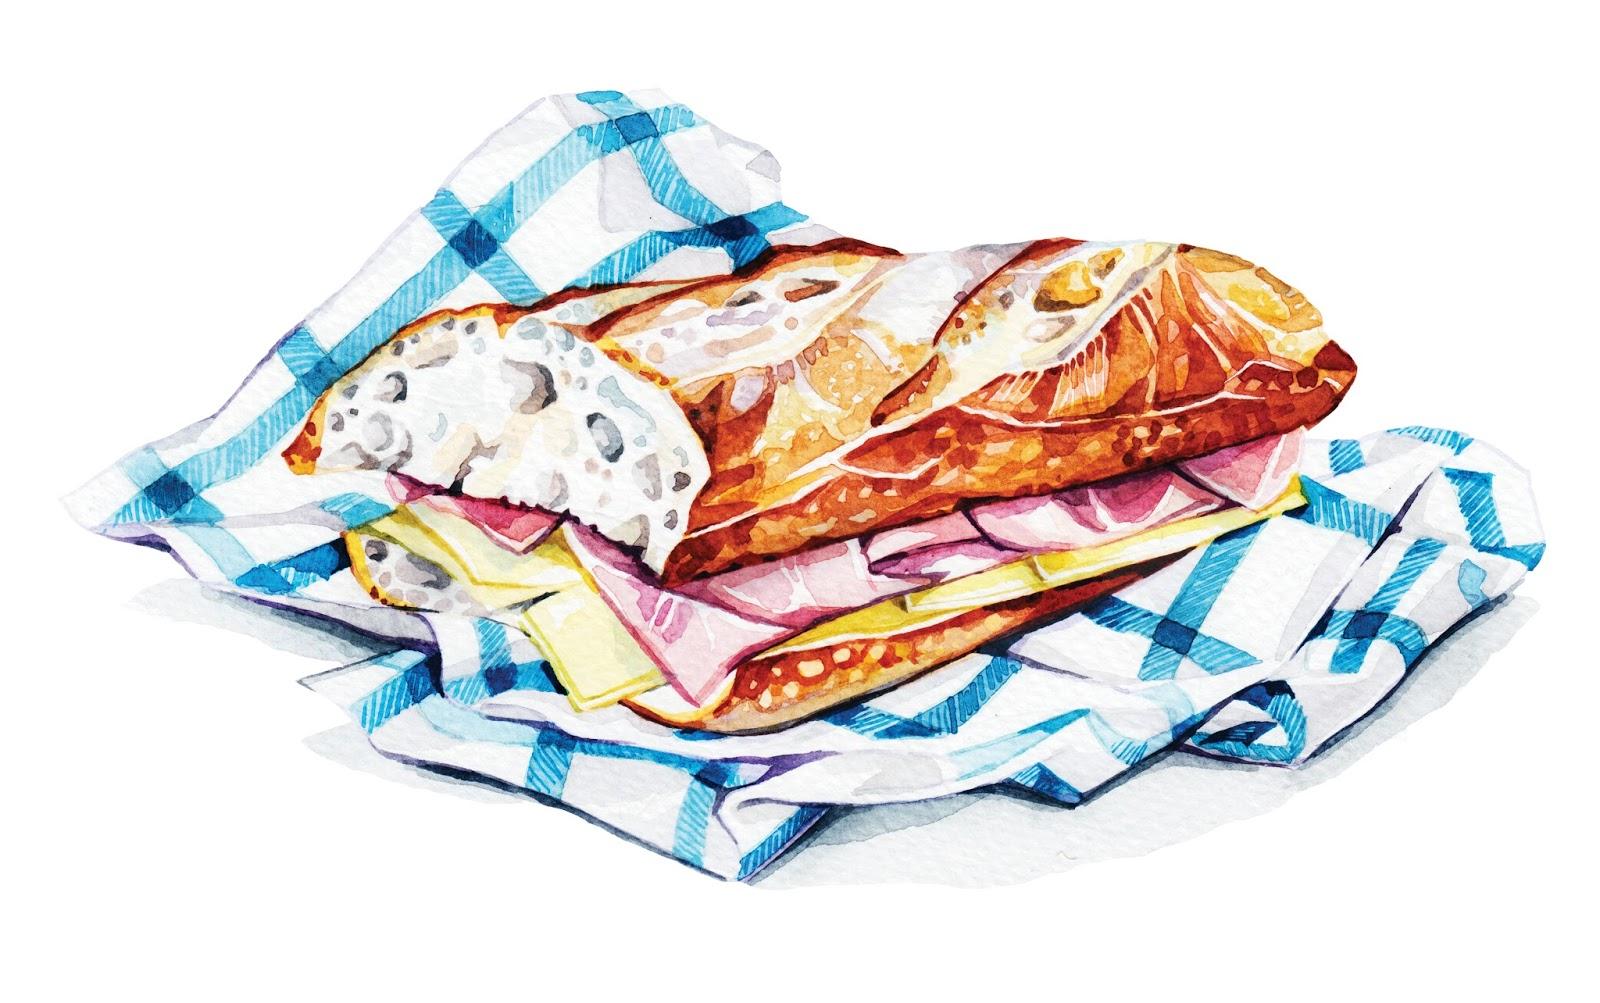 Food Service Norway